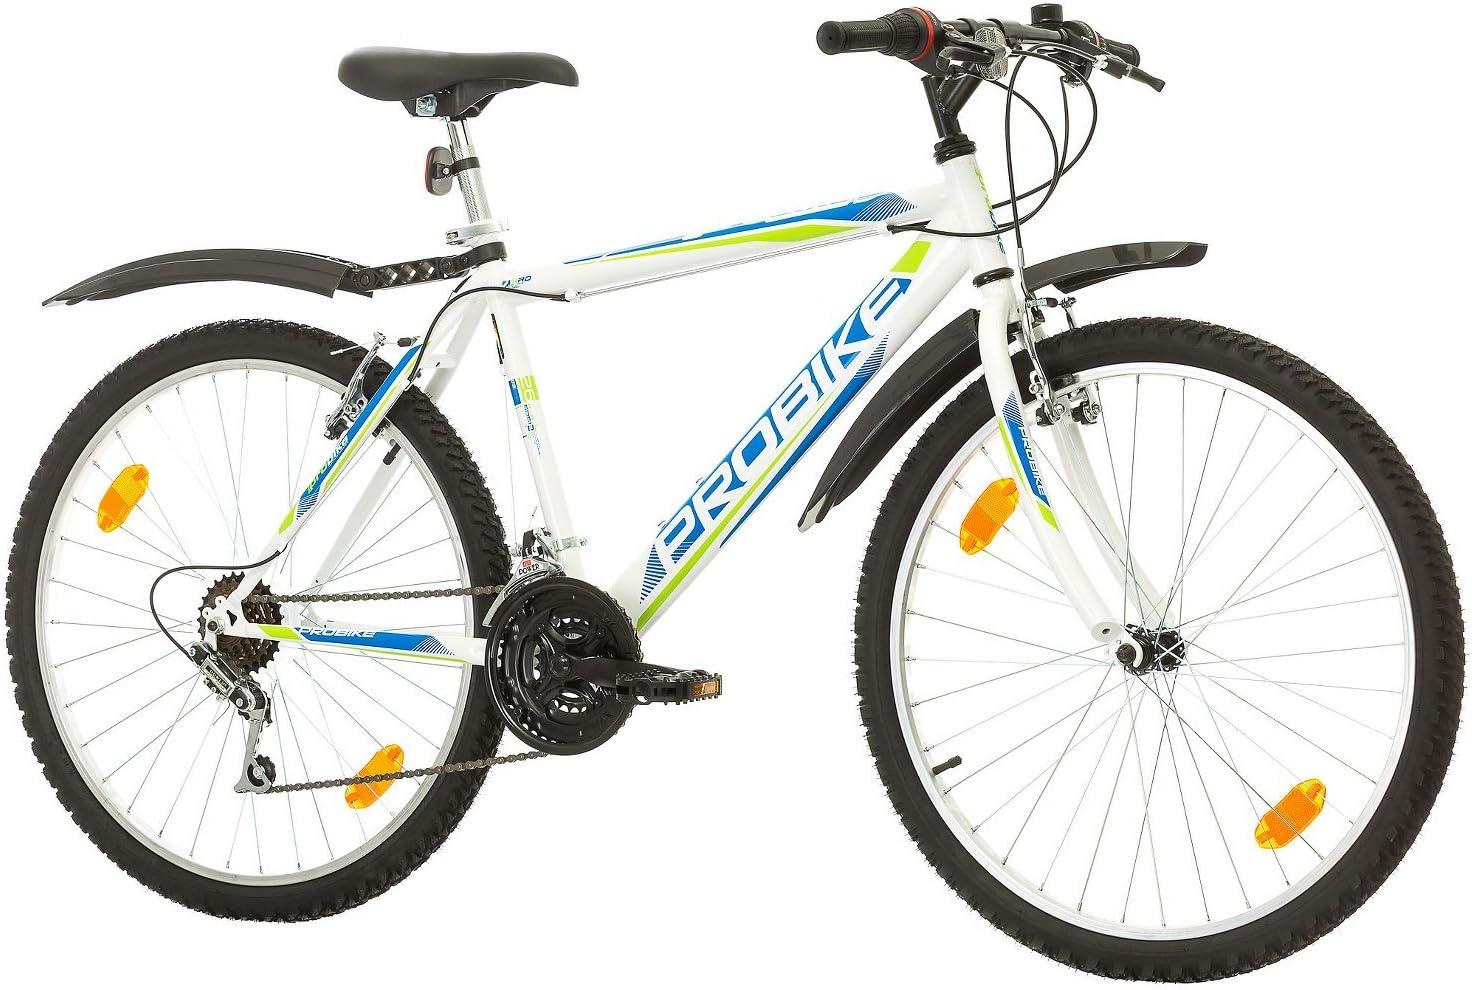 Herren-Fahrrad /& Jungen-Fahrrad geeignet ab 165-183 cm Multibrand PROBIKE 26 Zoll Mountainbike Shimano 18 Gang